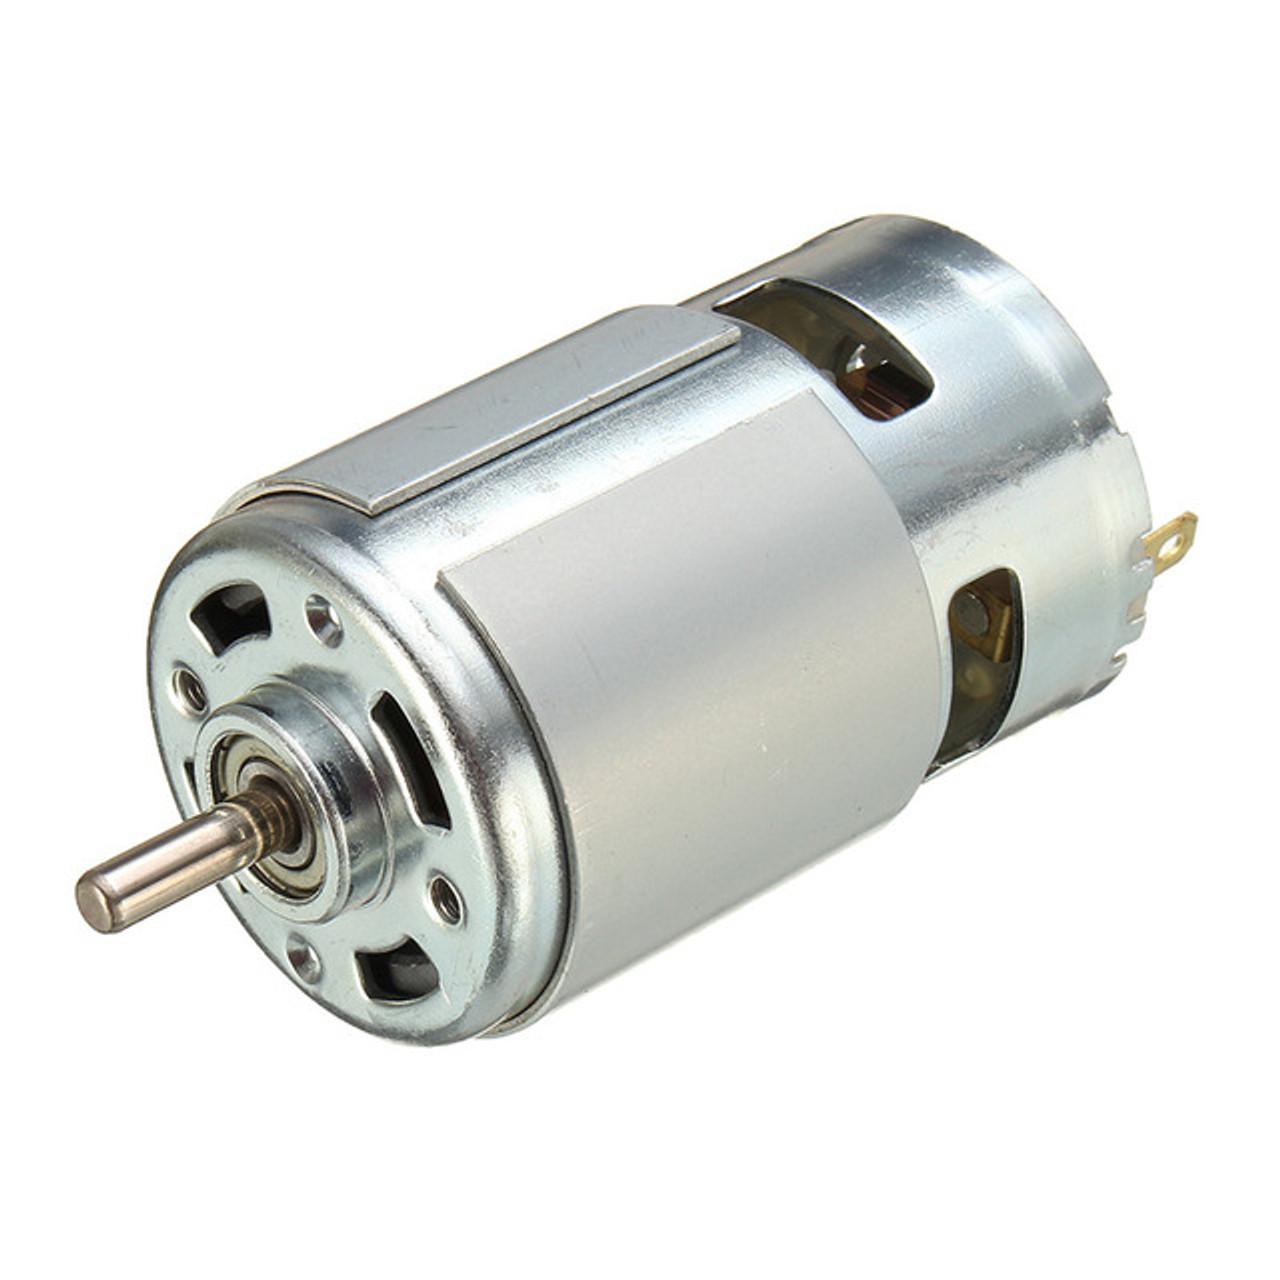 775-DC 12V-24V 15600RPM circular shaft motor